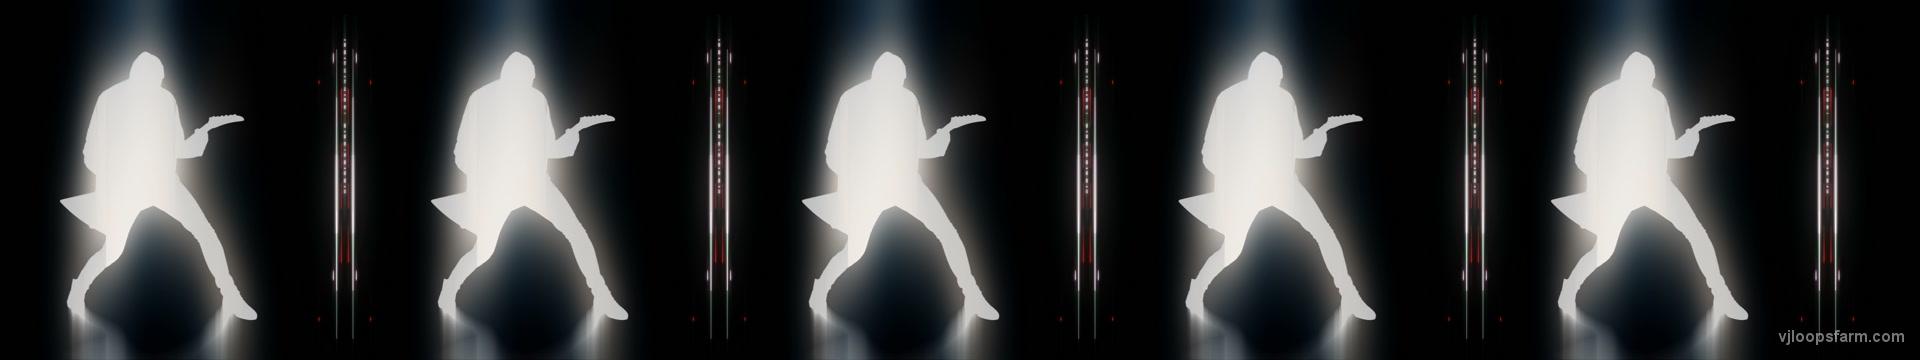 vj video background Ultra-wide-tripple-head-Rock-Man-Guitarist-strobing-visuals-Video-ARt-VJ-Footage_003